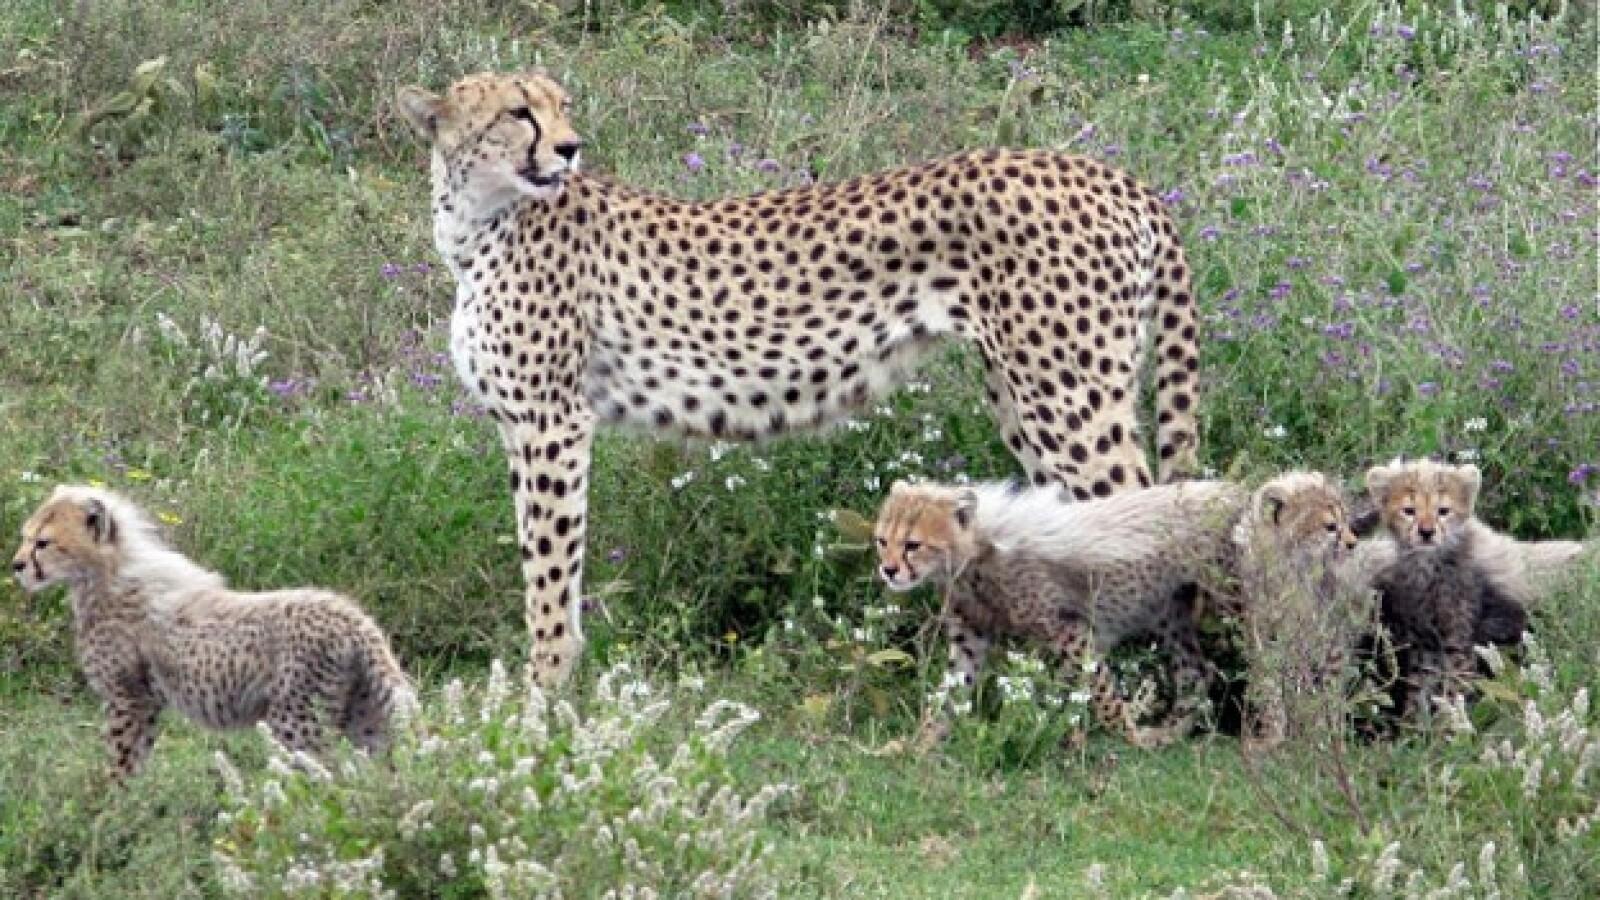 Tanzania: Take a ride on the wild side chita